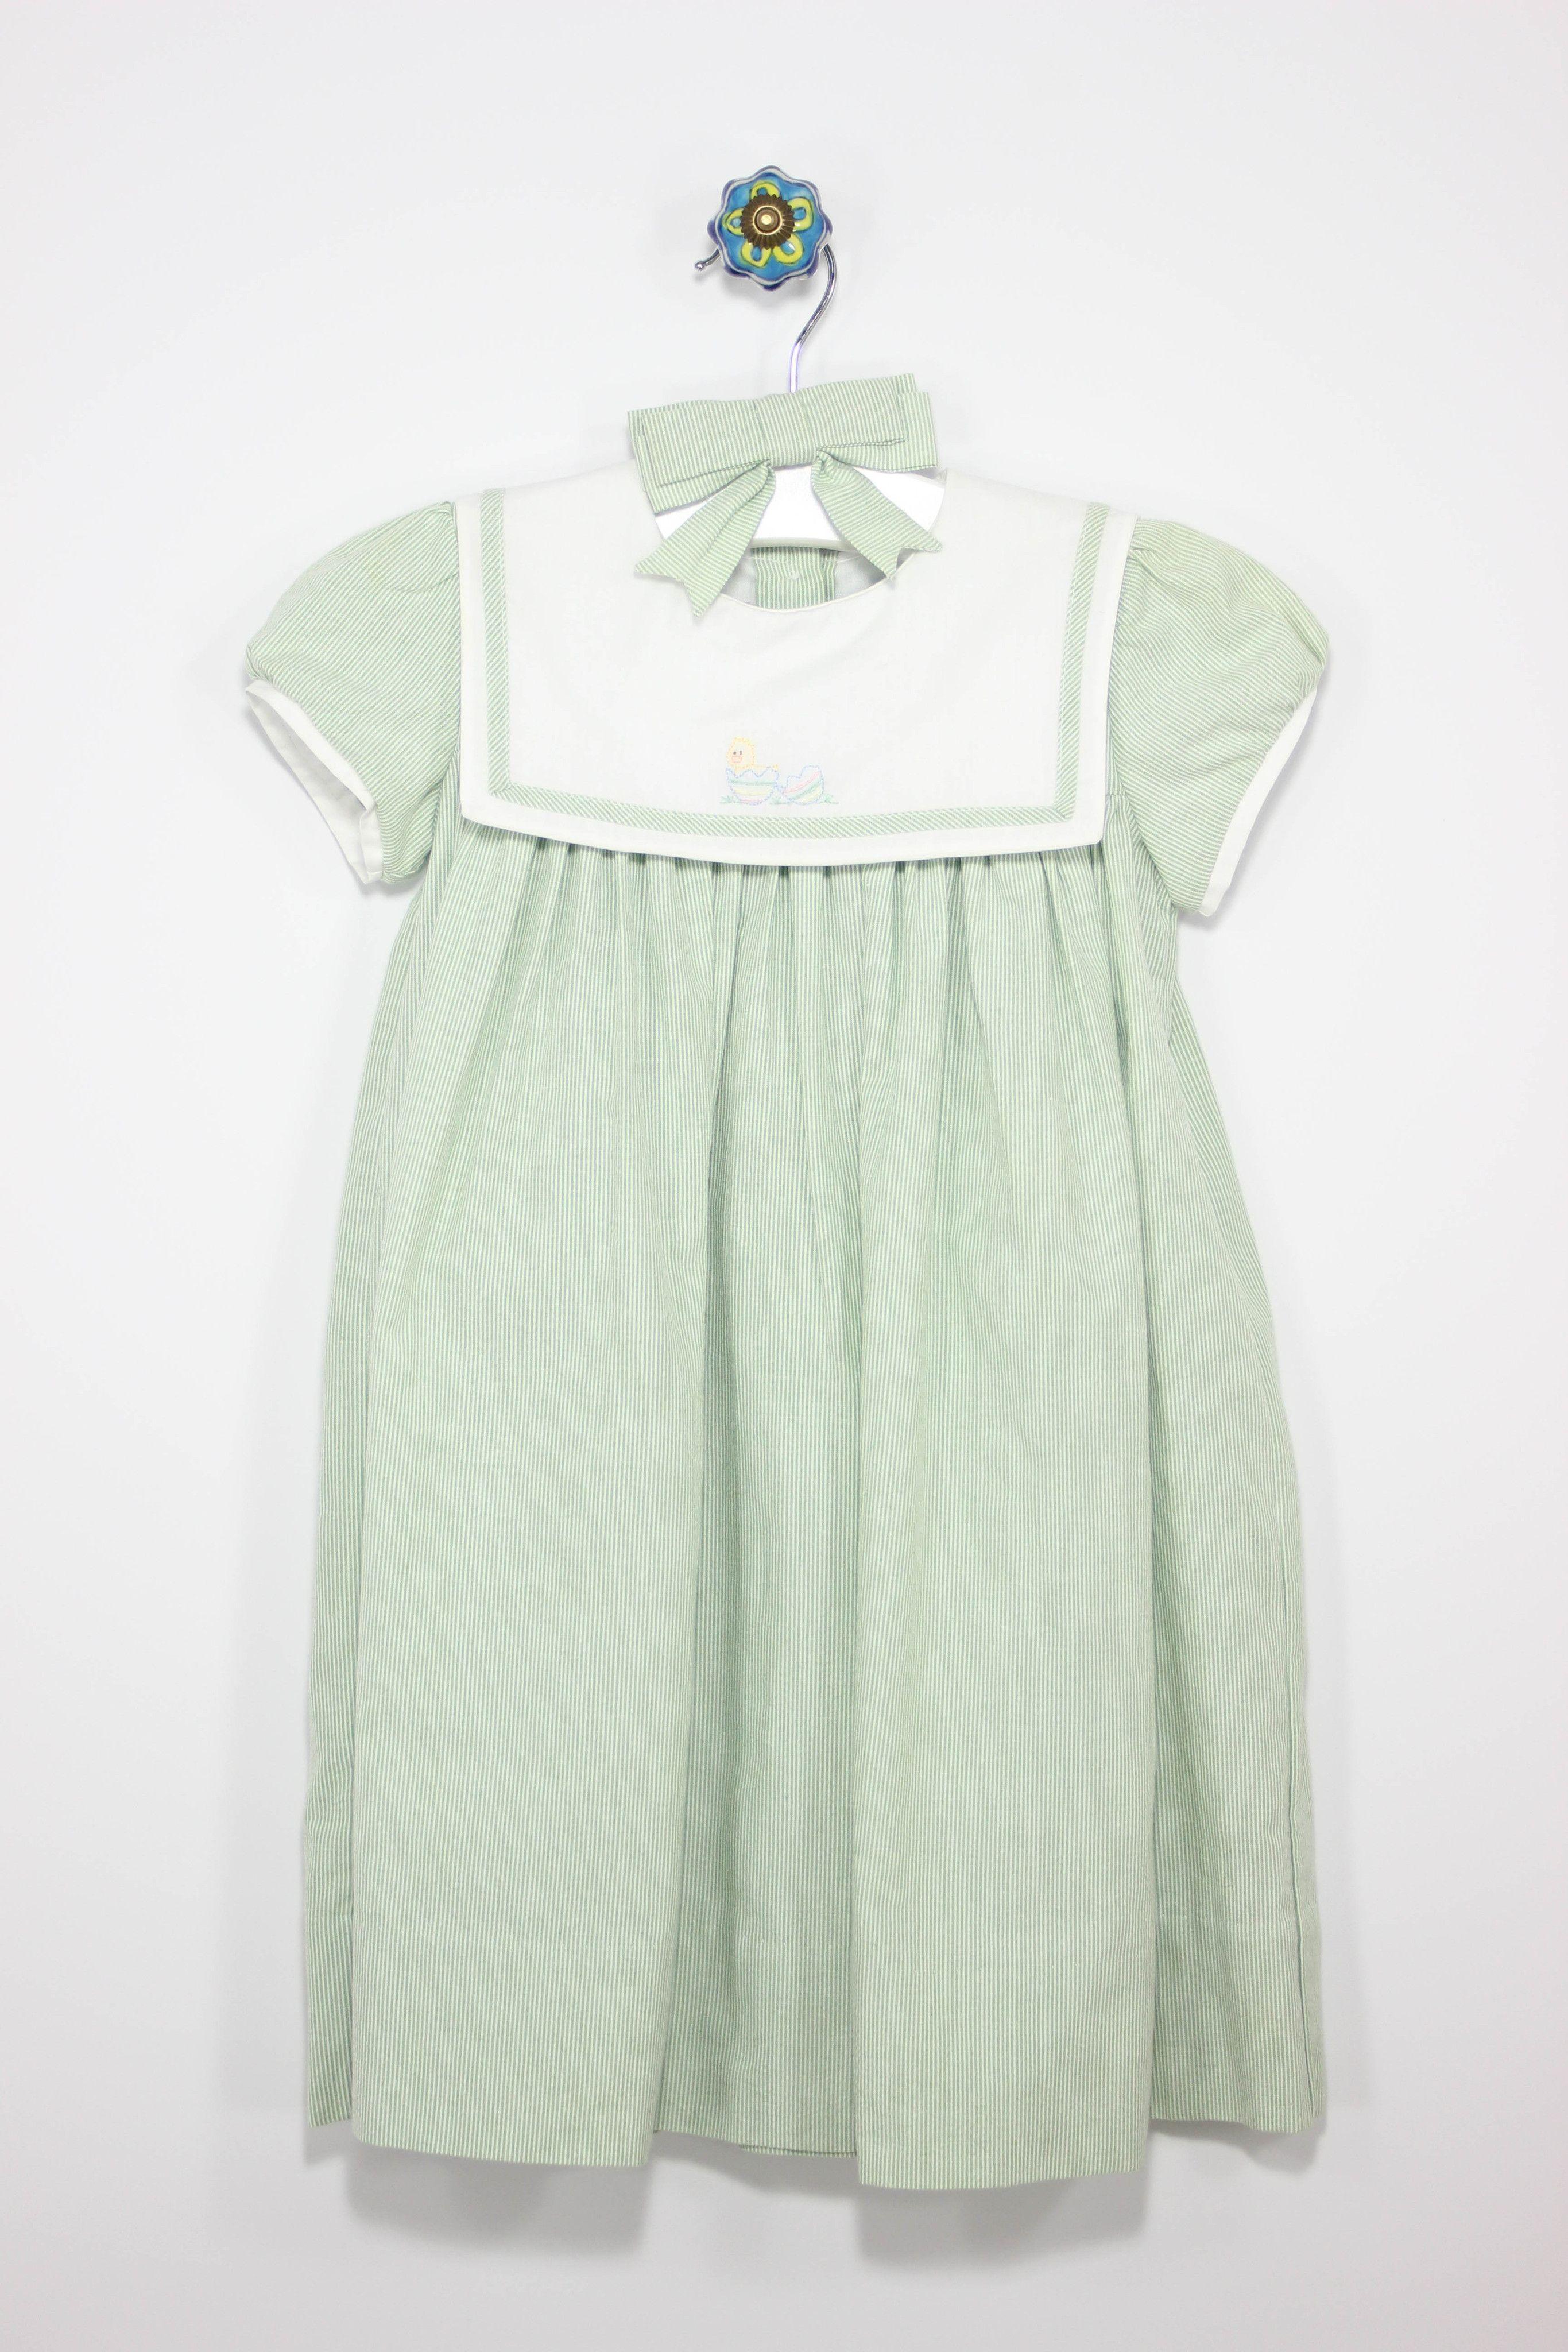 Strasburg Size 2T Party Dress + Hair Clip